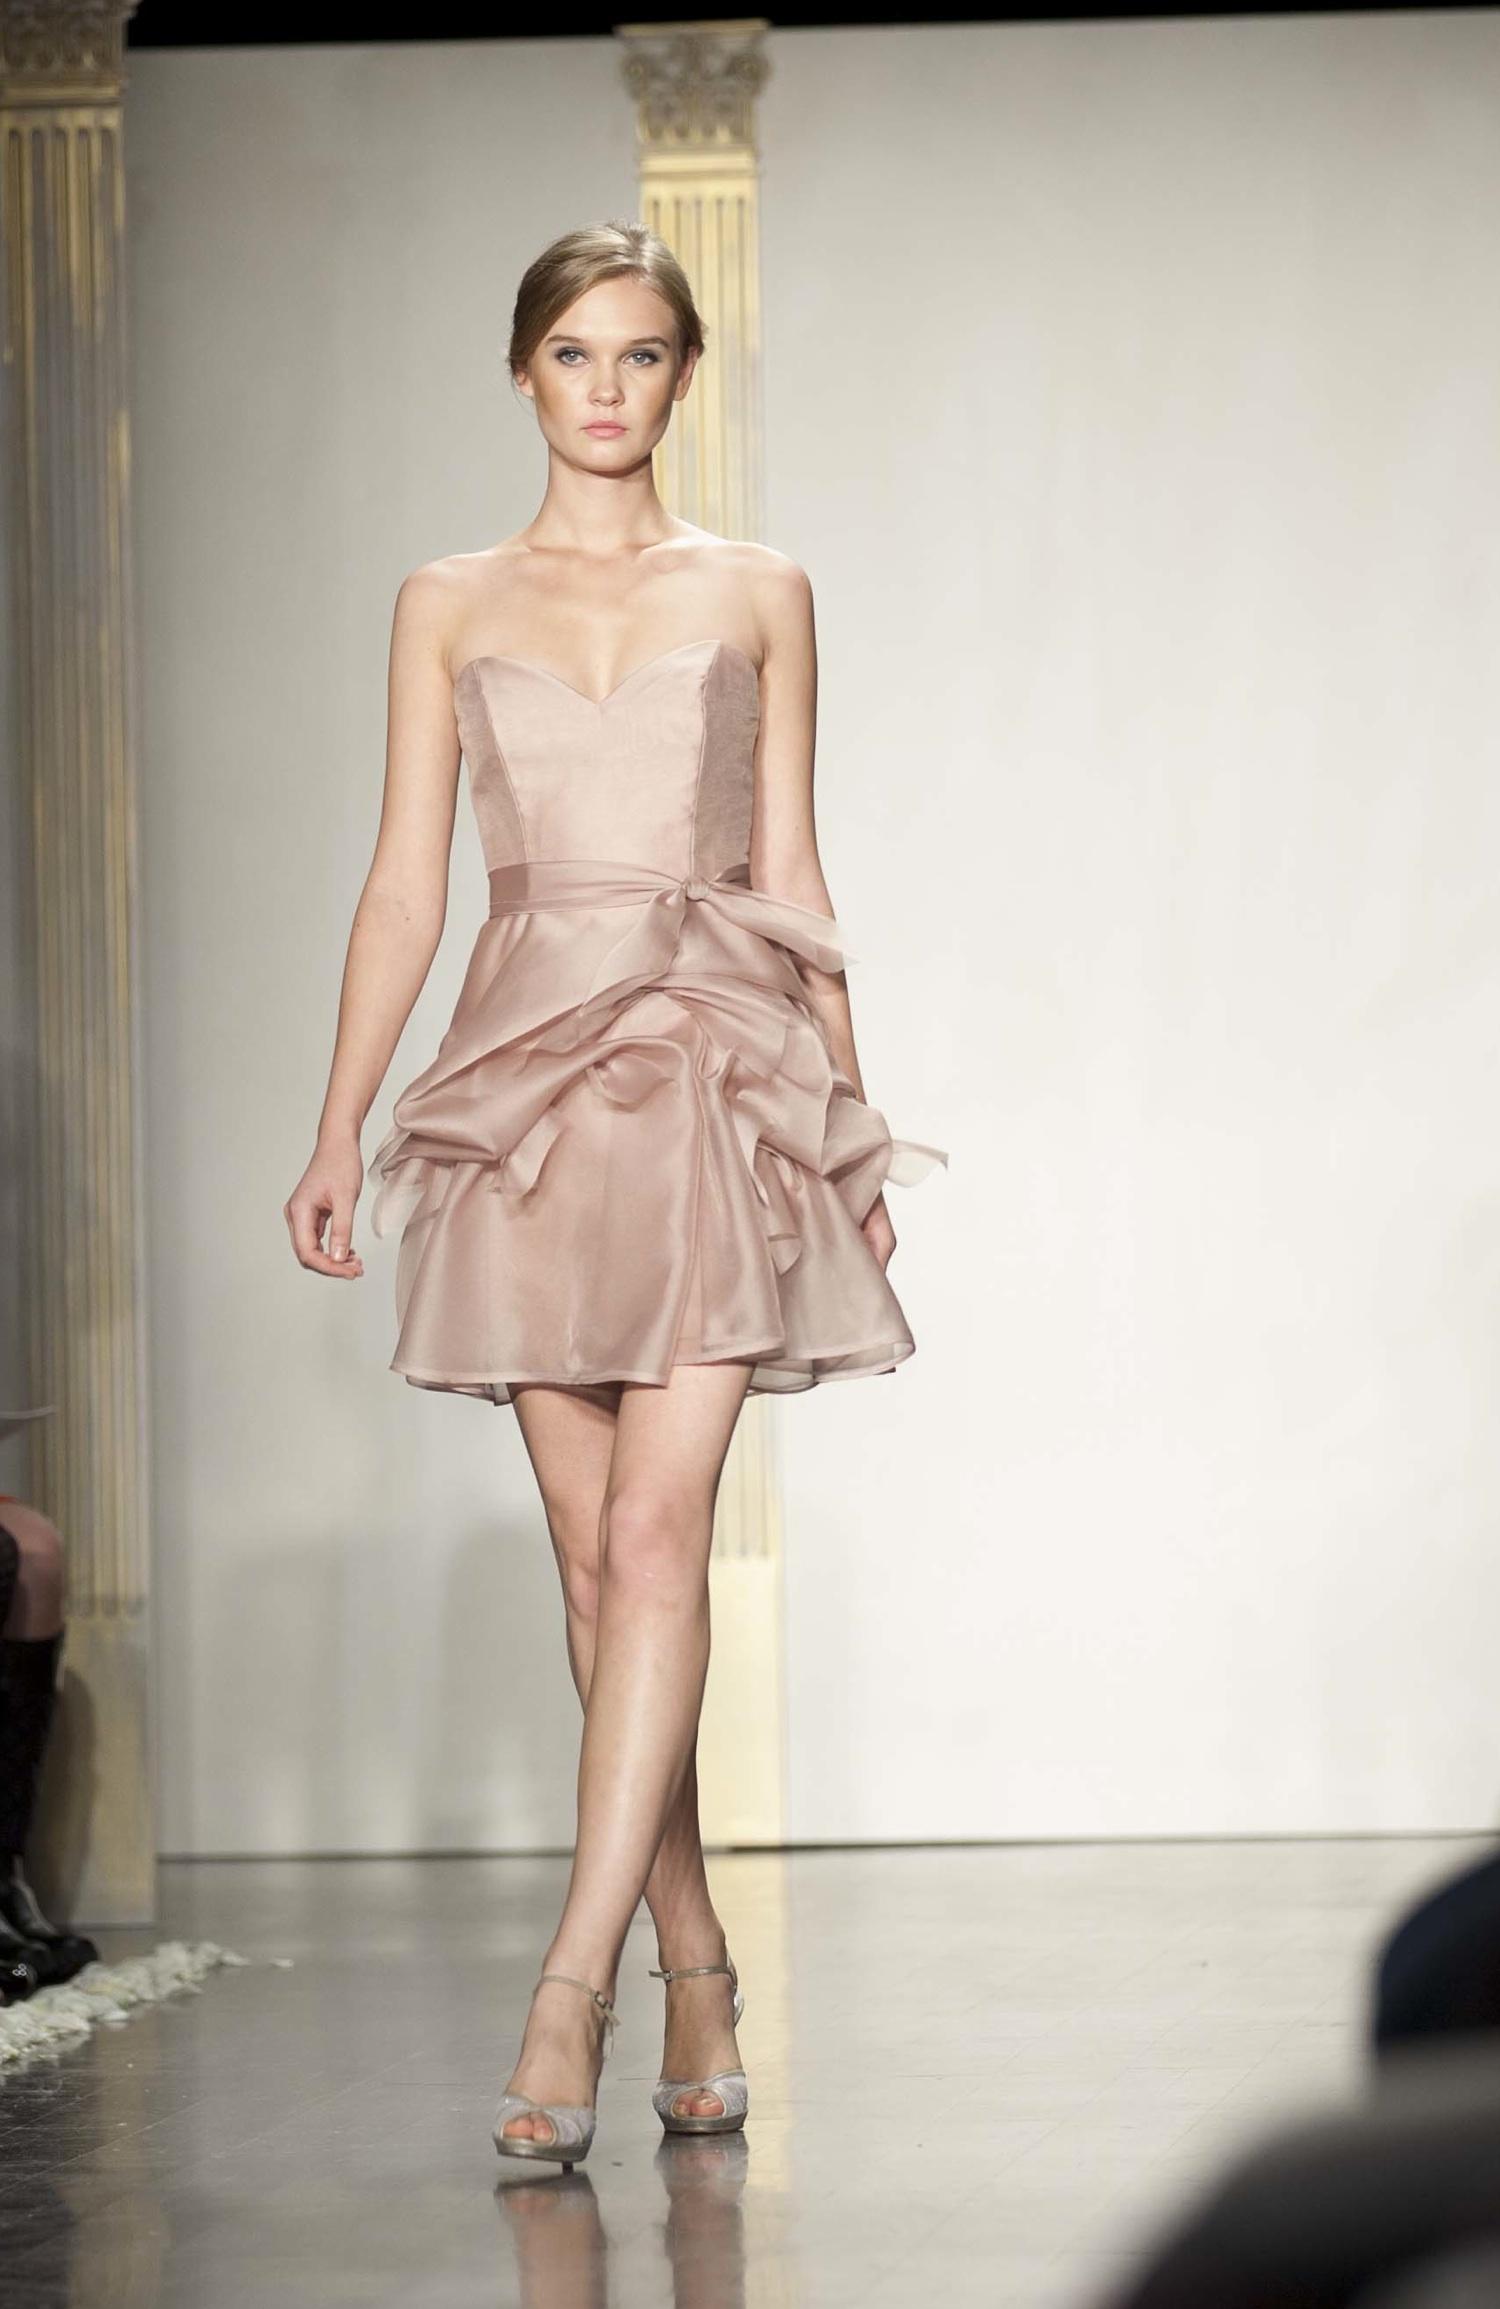 Iridescent bridesmaid dress